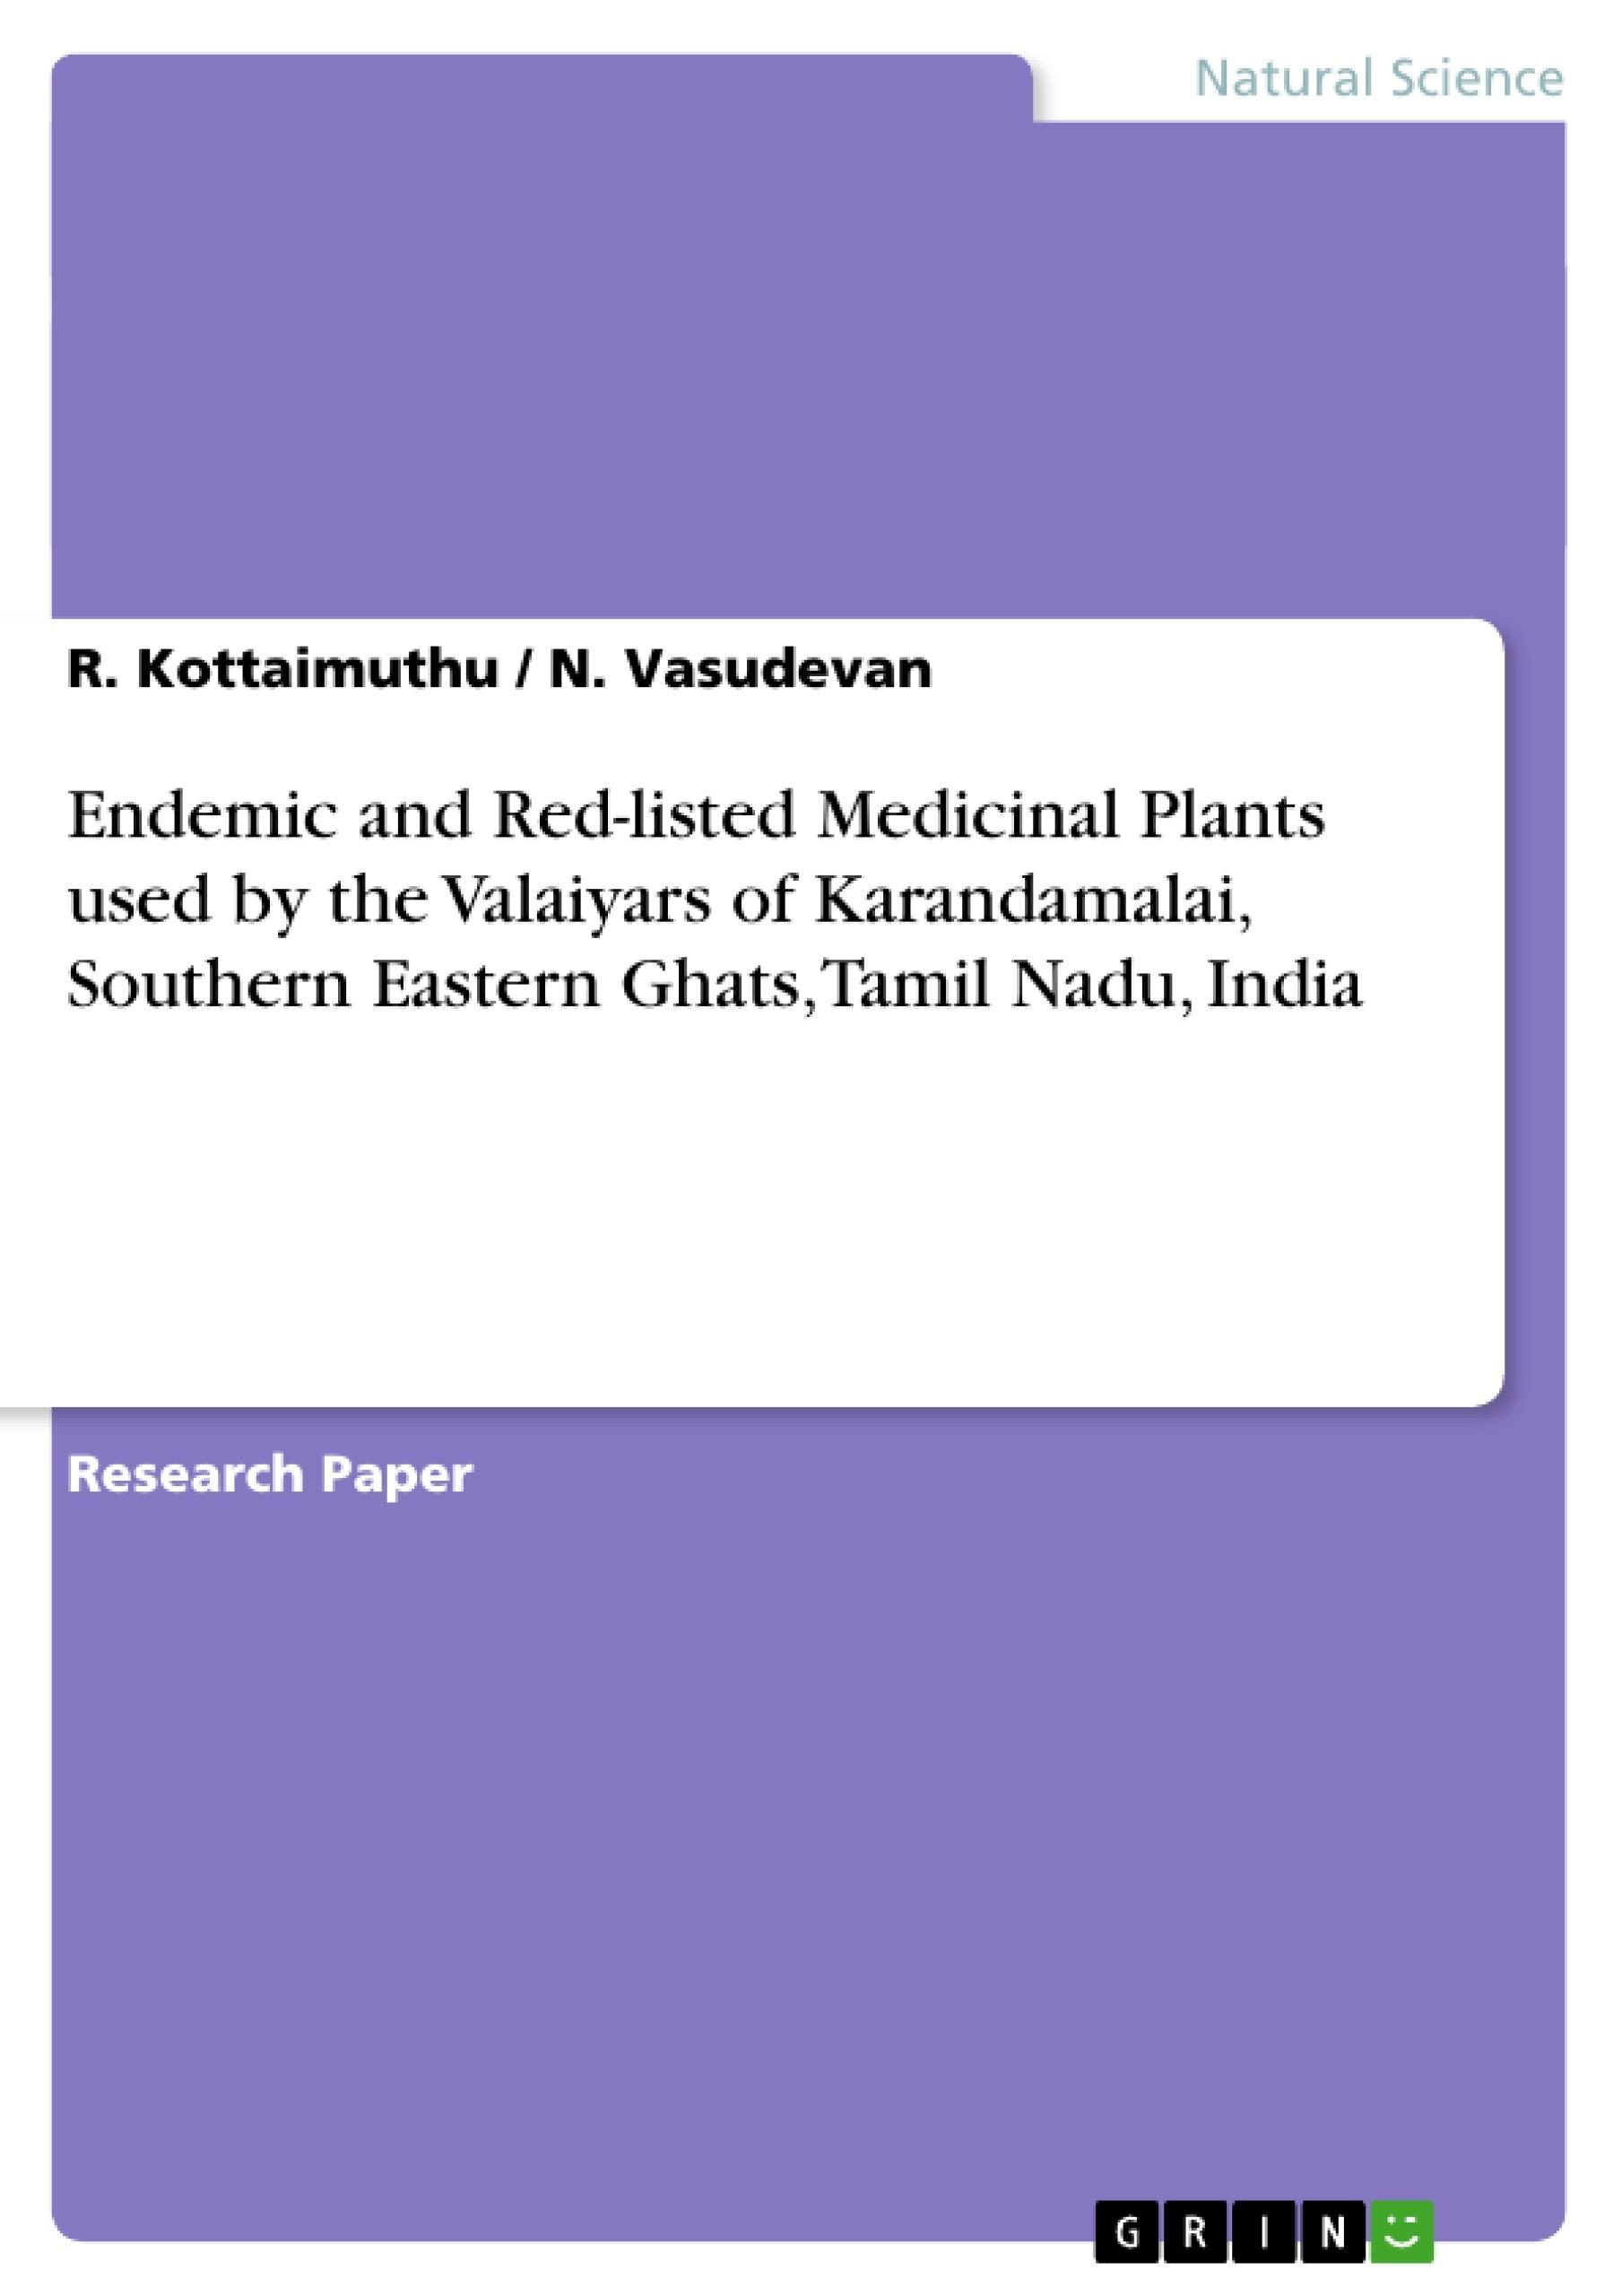 Title: Endemic and Red-listed Medicinal Plants used by the Valaiyars of Karandamalai, Southern Eastern Ghats, Tamil Nadu, India